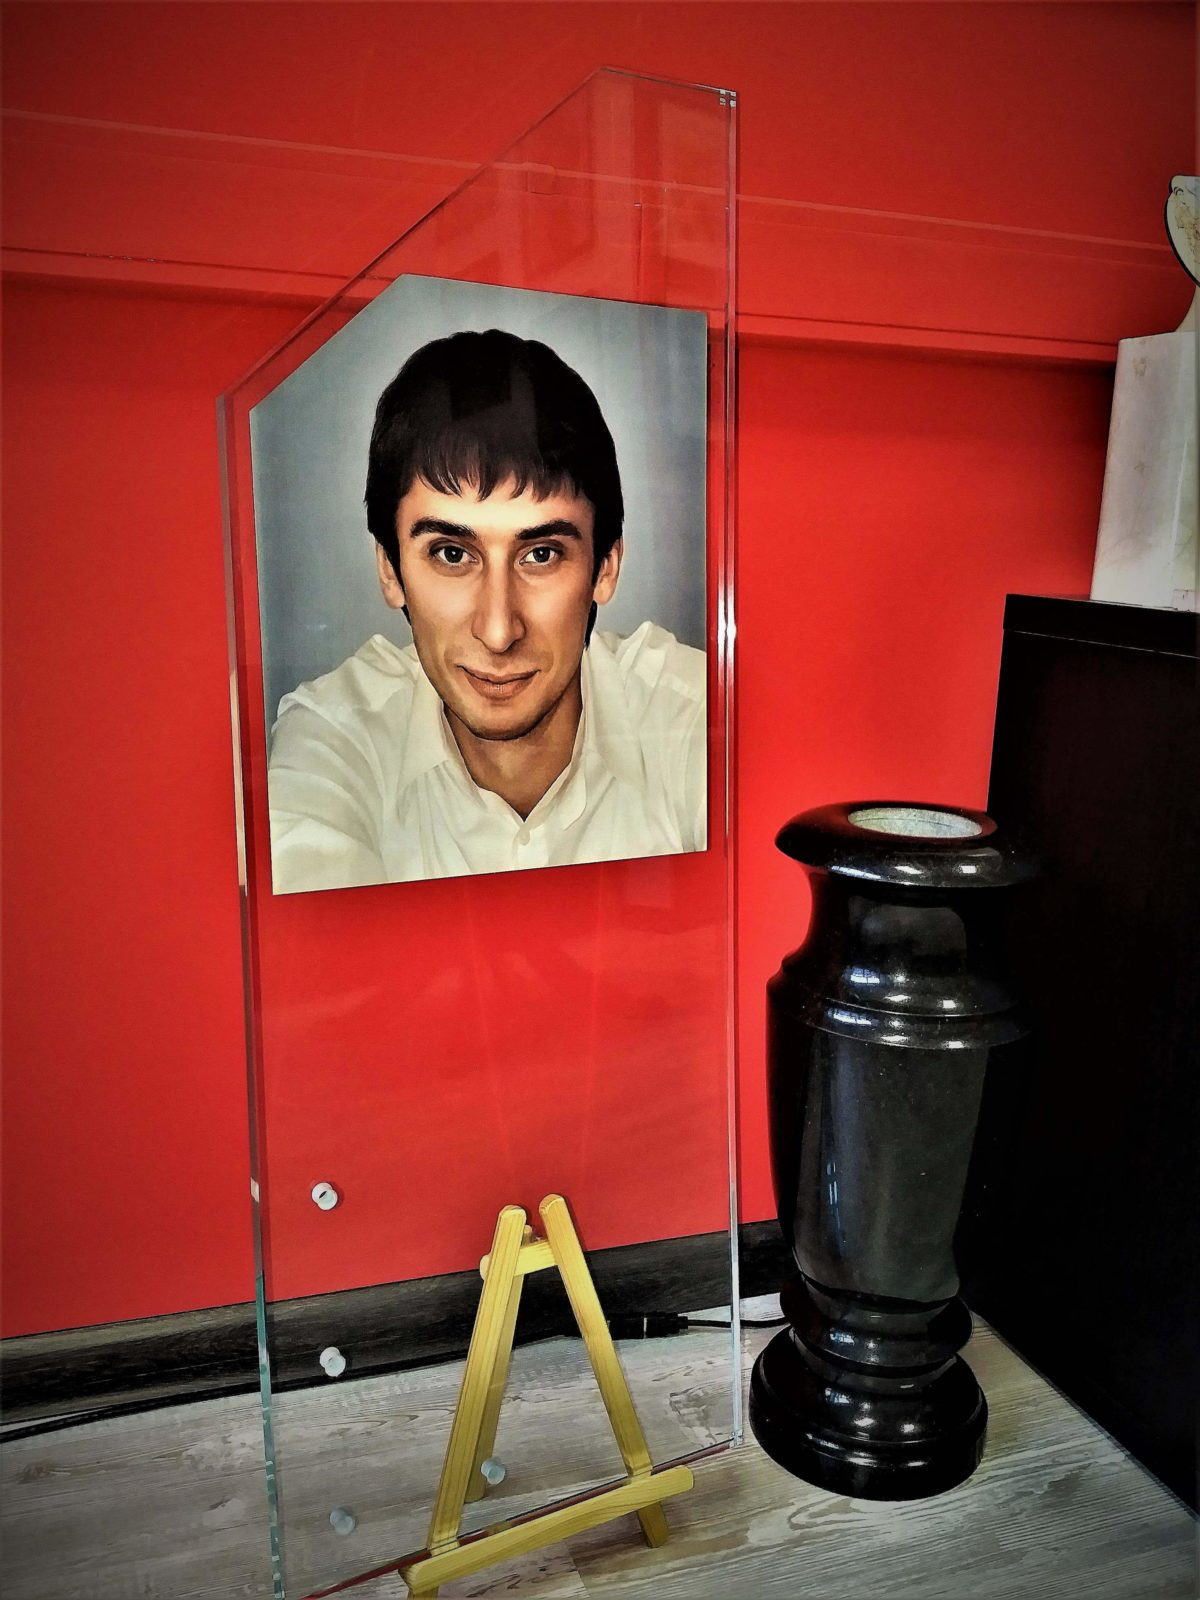 Фото в стекле №3Мемориал